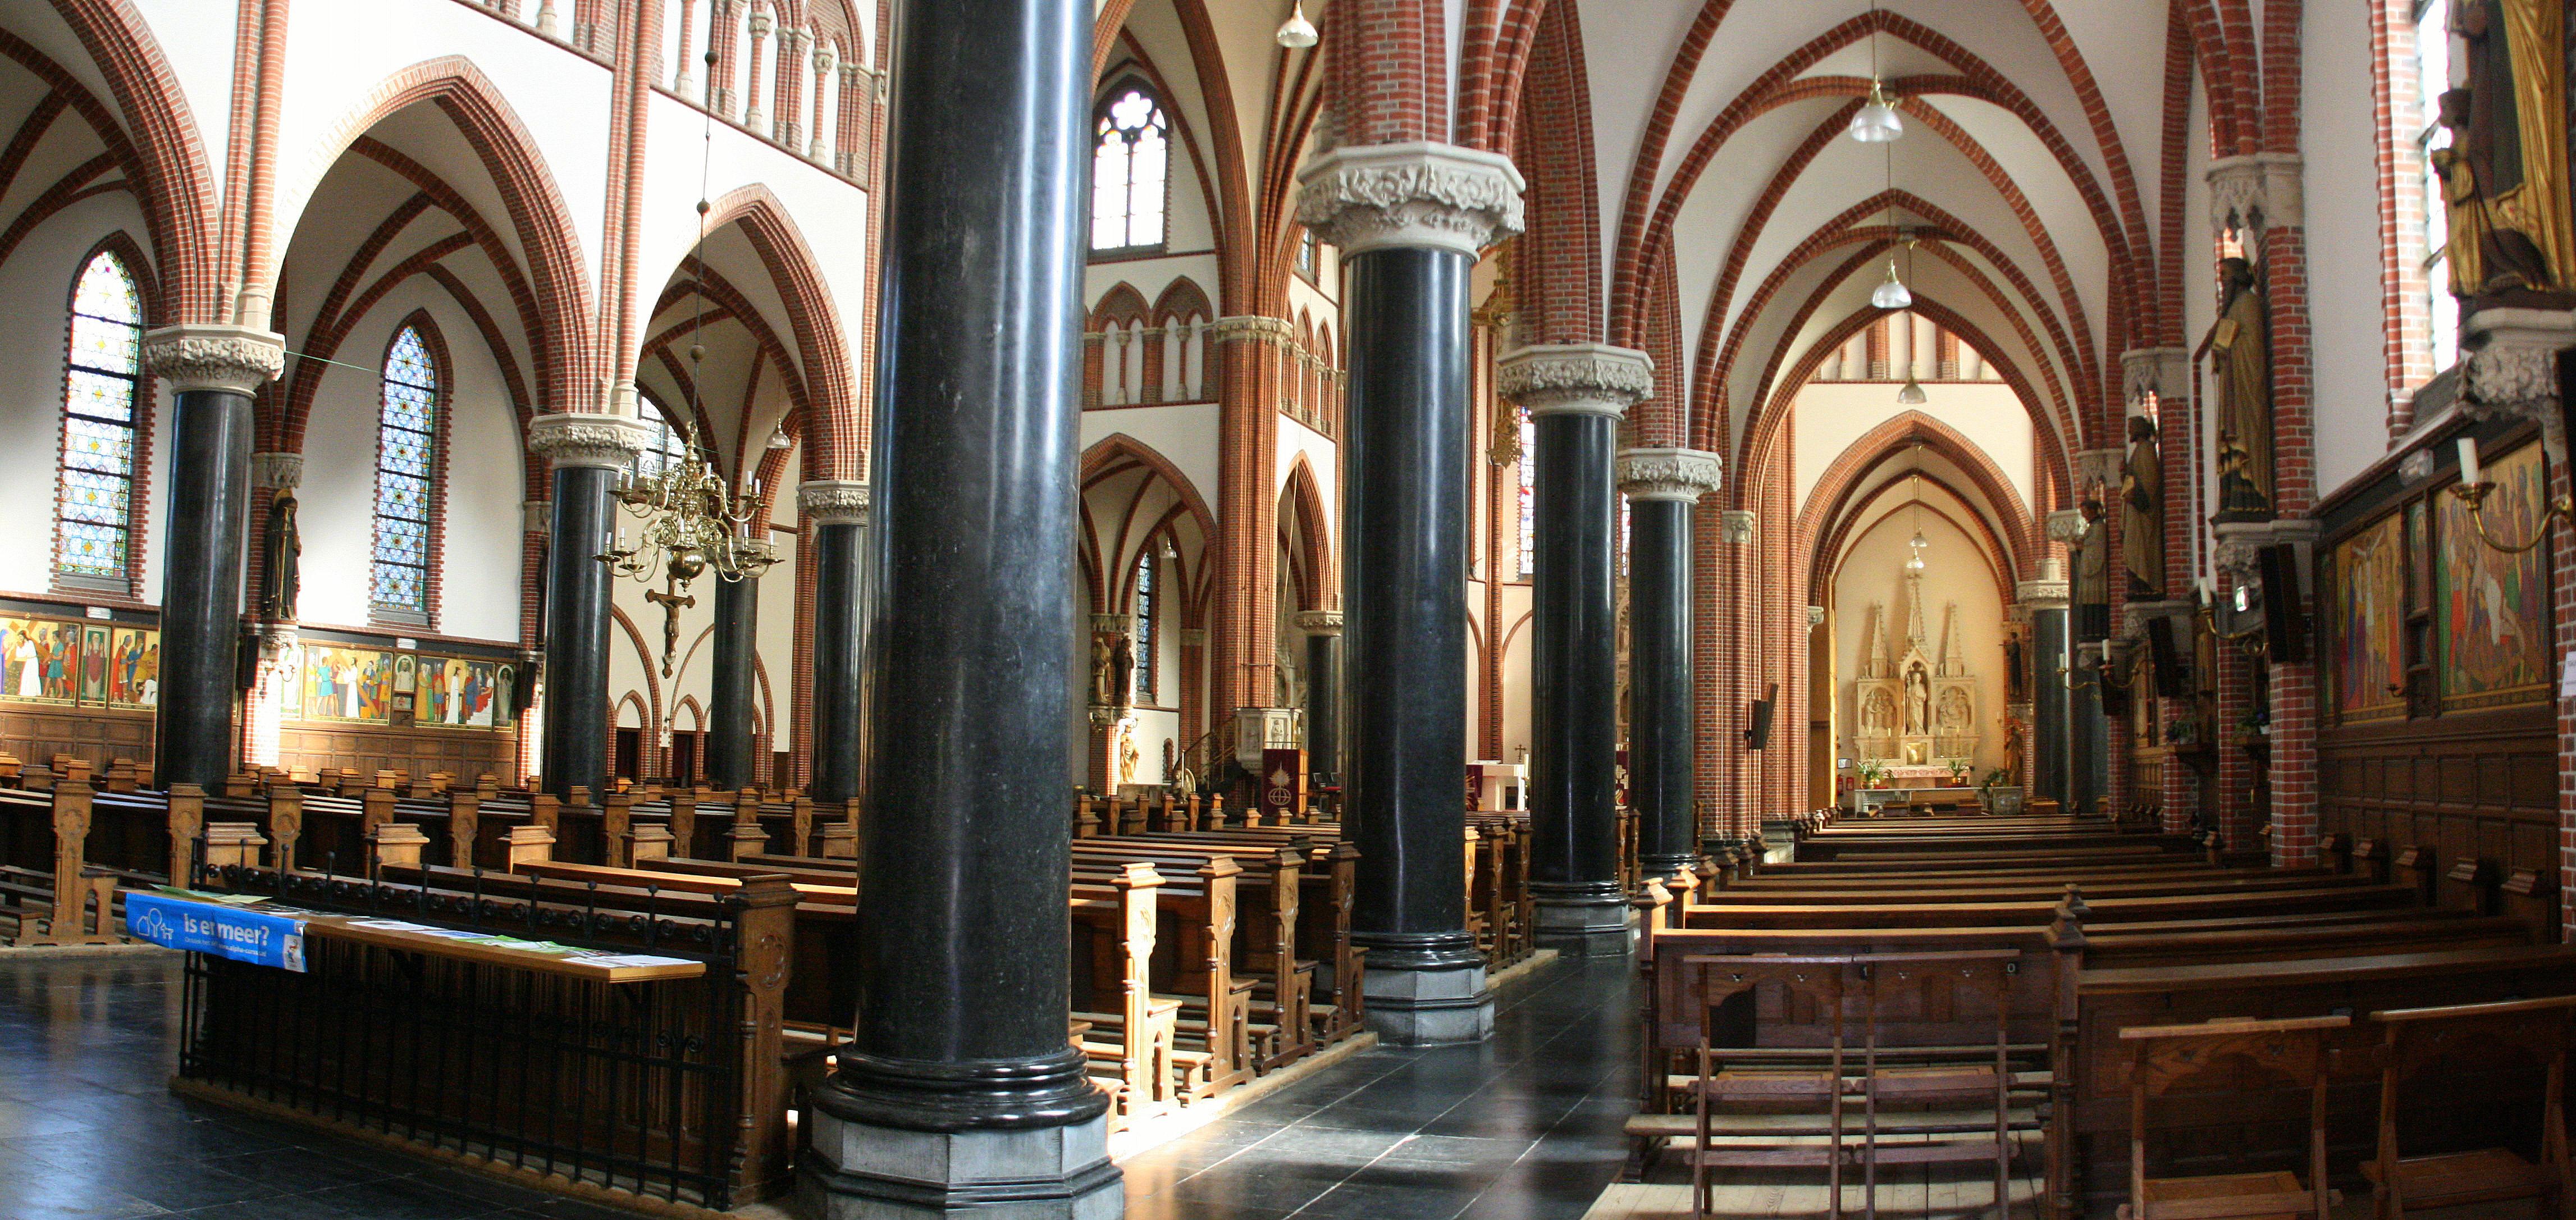 file budel kerkstraat 10 o l vrouw visitatie kerk